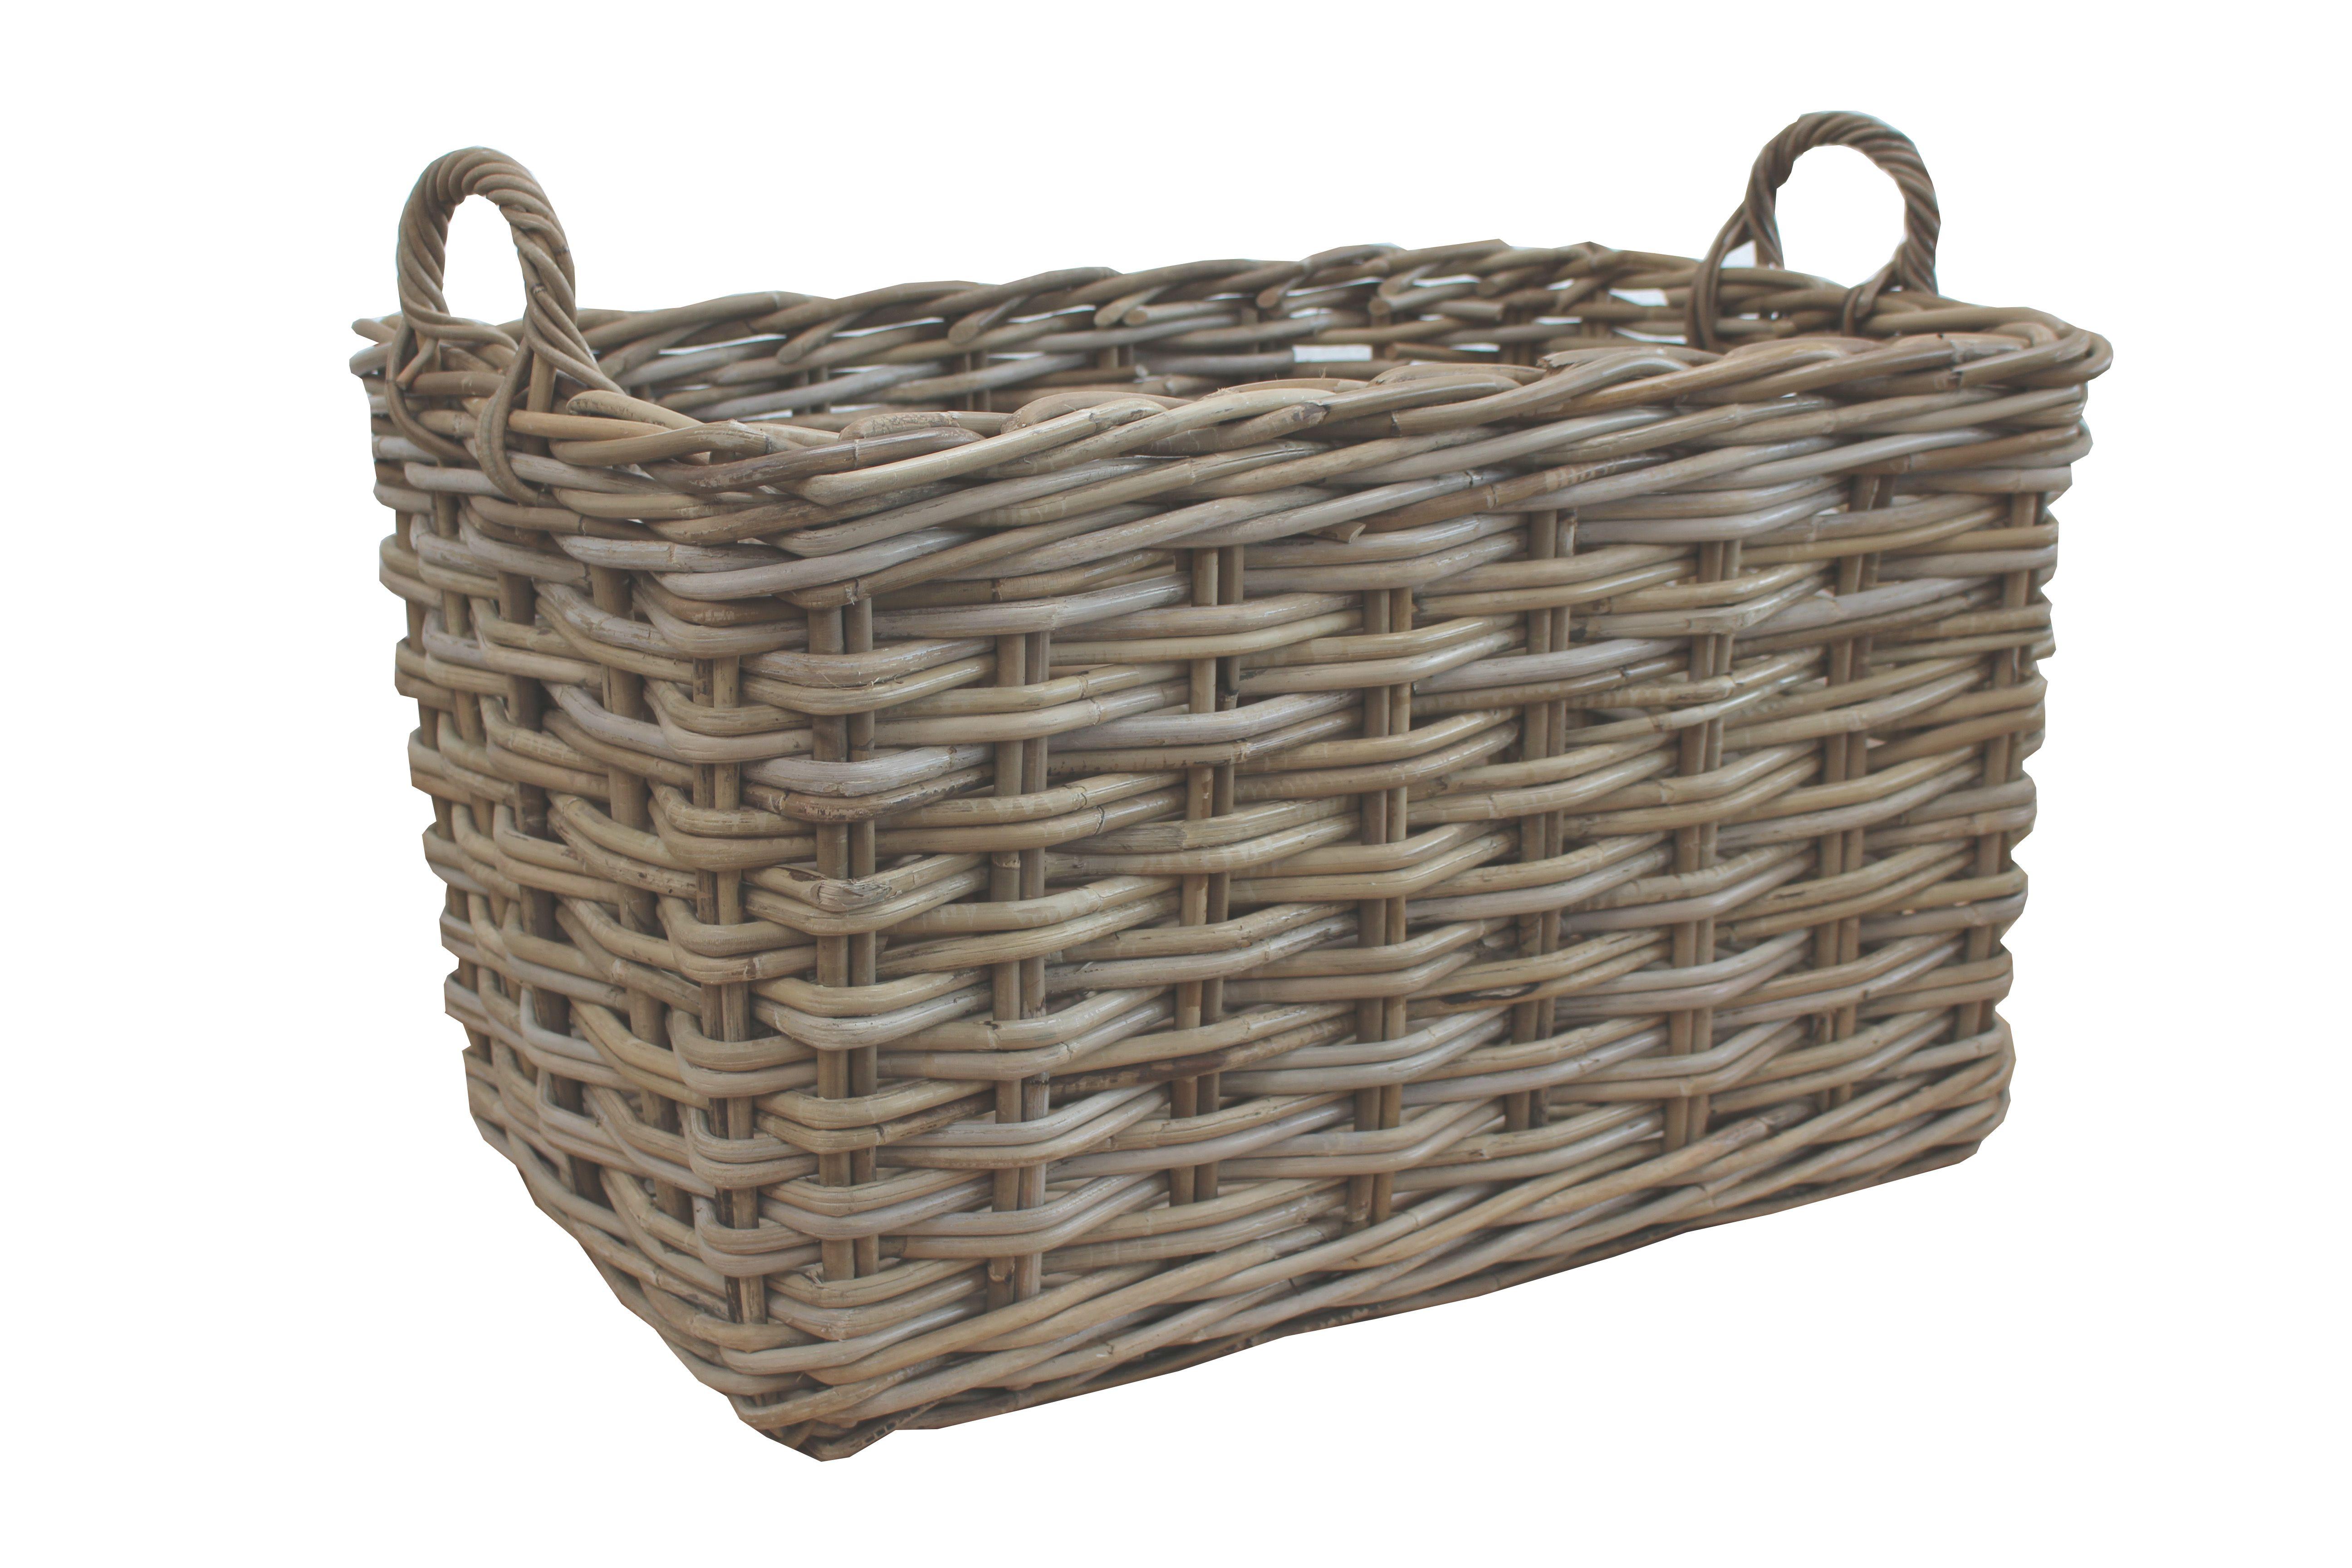 Large Grey Buff Rattan Wicker Storage Basket Integral Handles Drawer Logs Wood